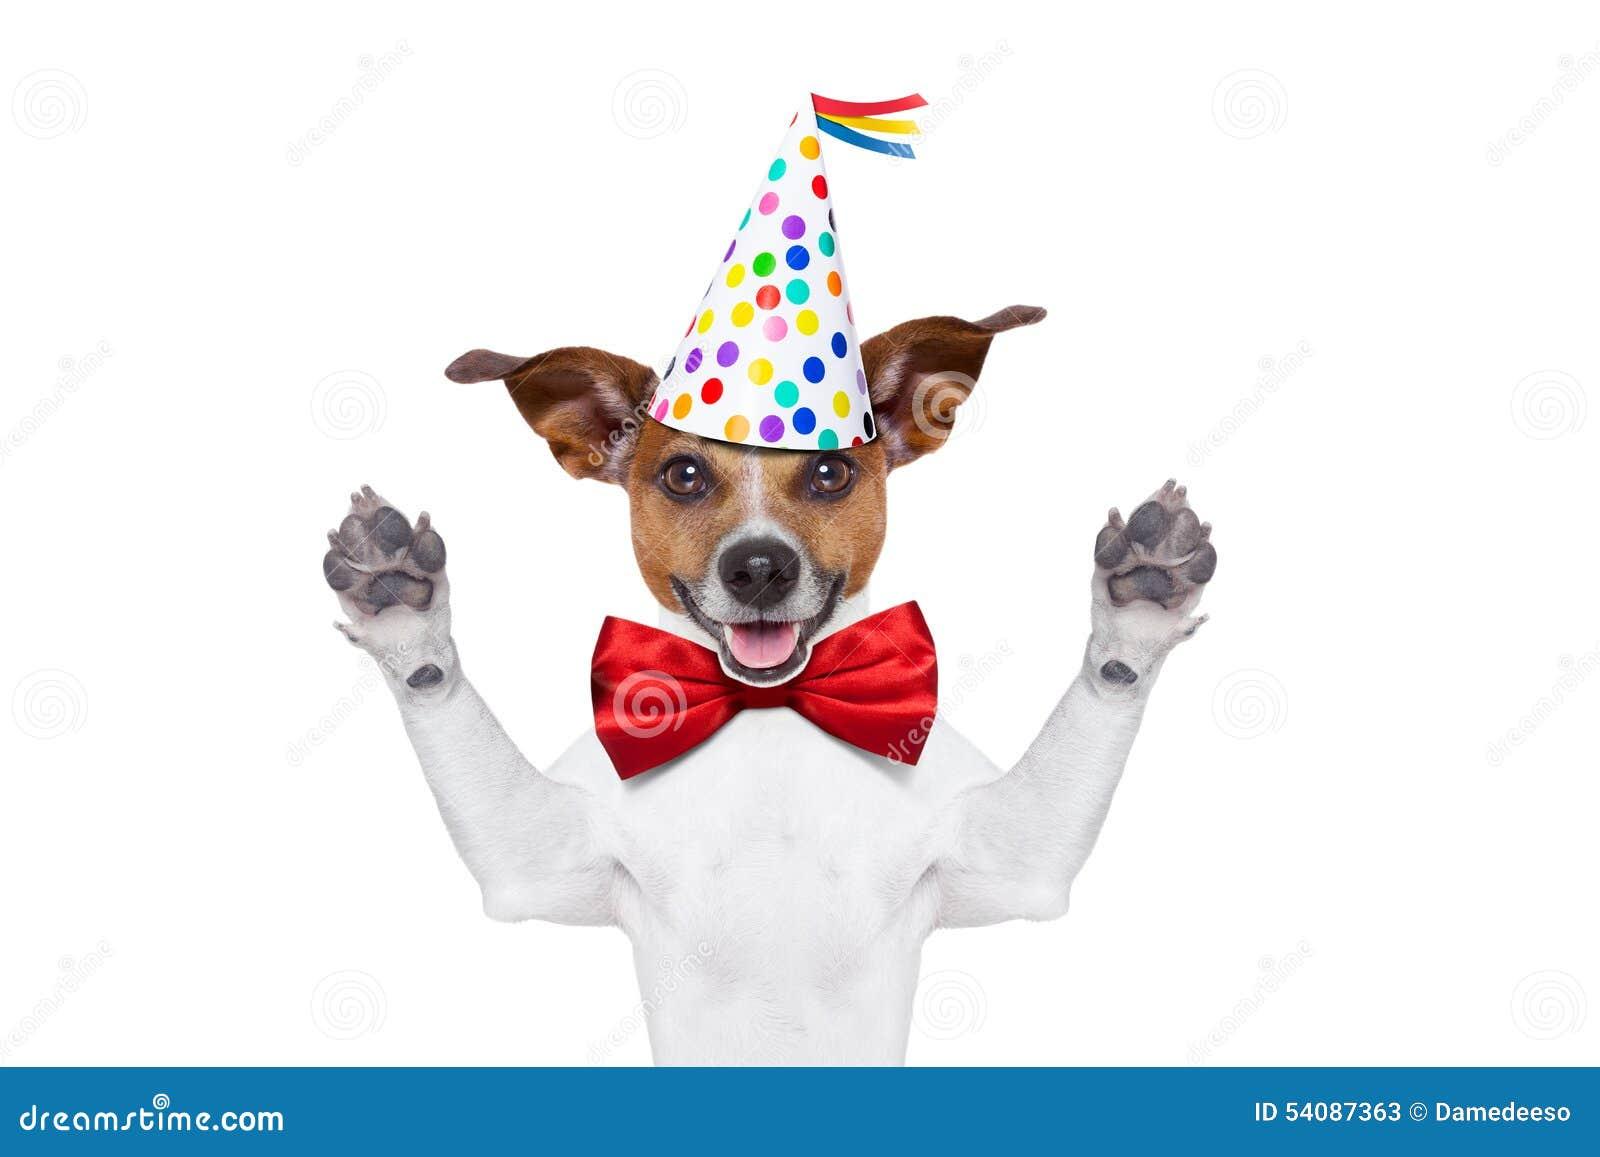 Jack Russell Birthday Cake